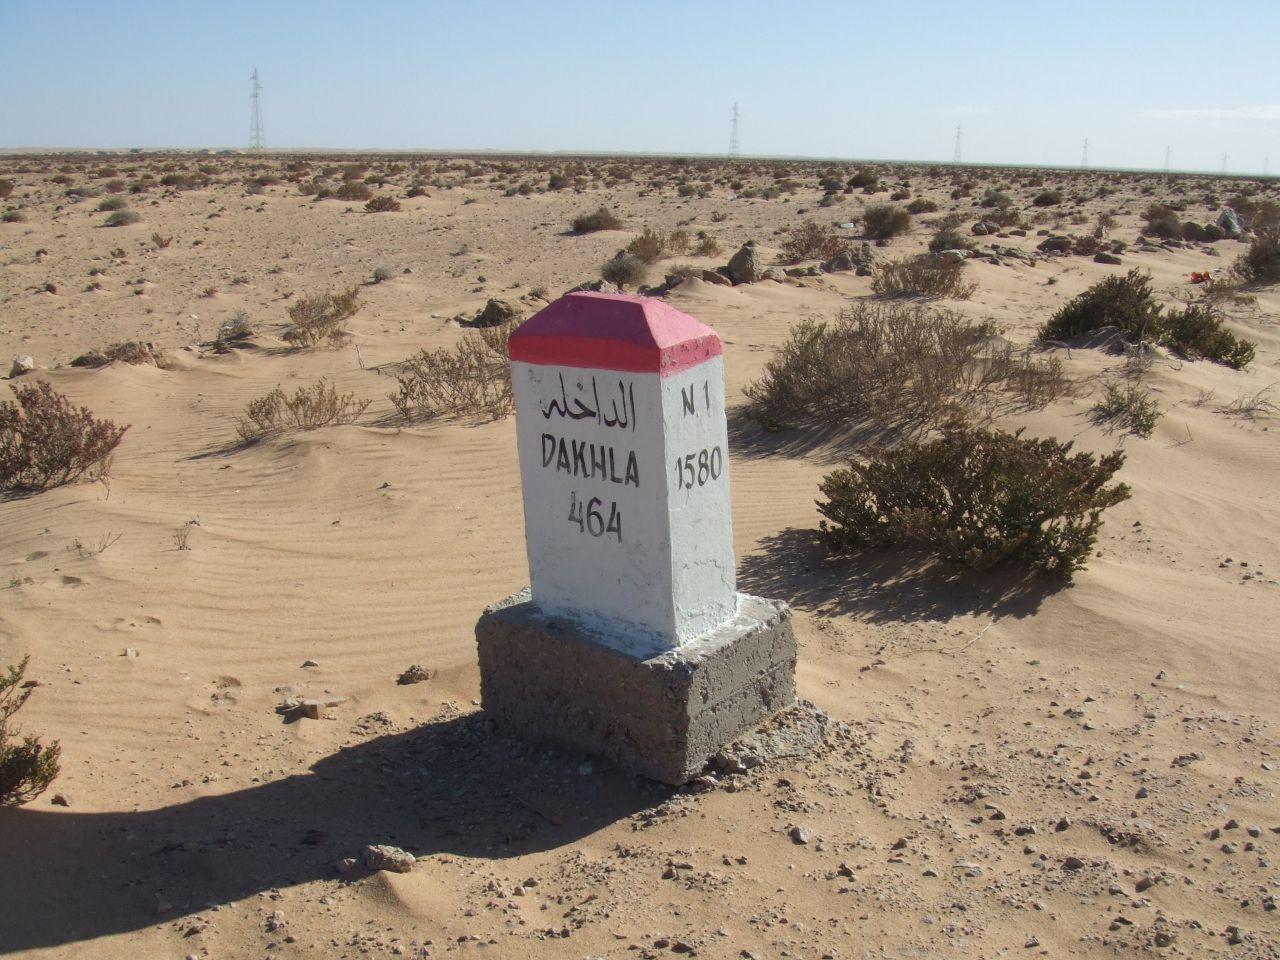 Bombe :p... - Page 2 Mojon_kilometrico_en_la_ruta_N1_indicando_464_km_a_Dajla_(Sahara_Occidental)